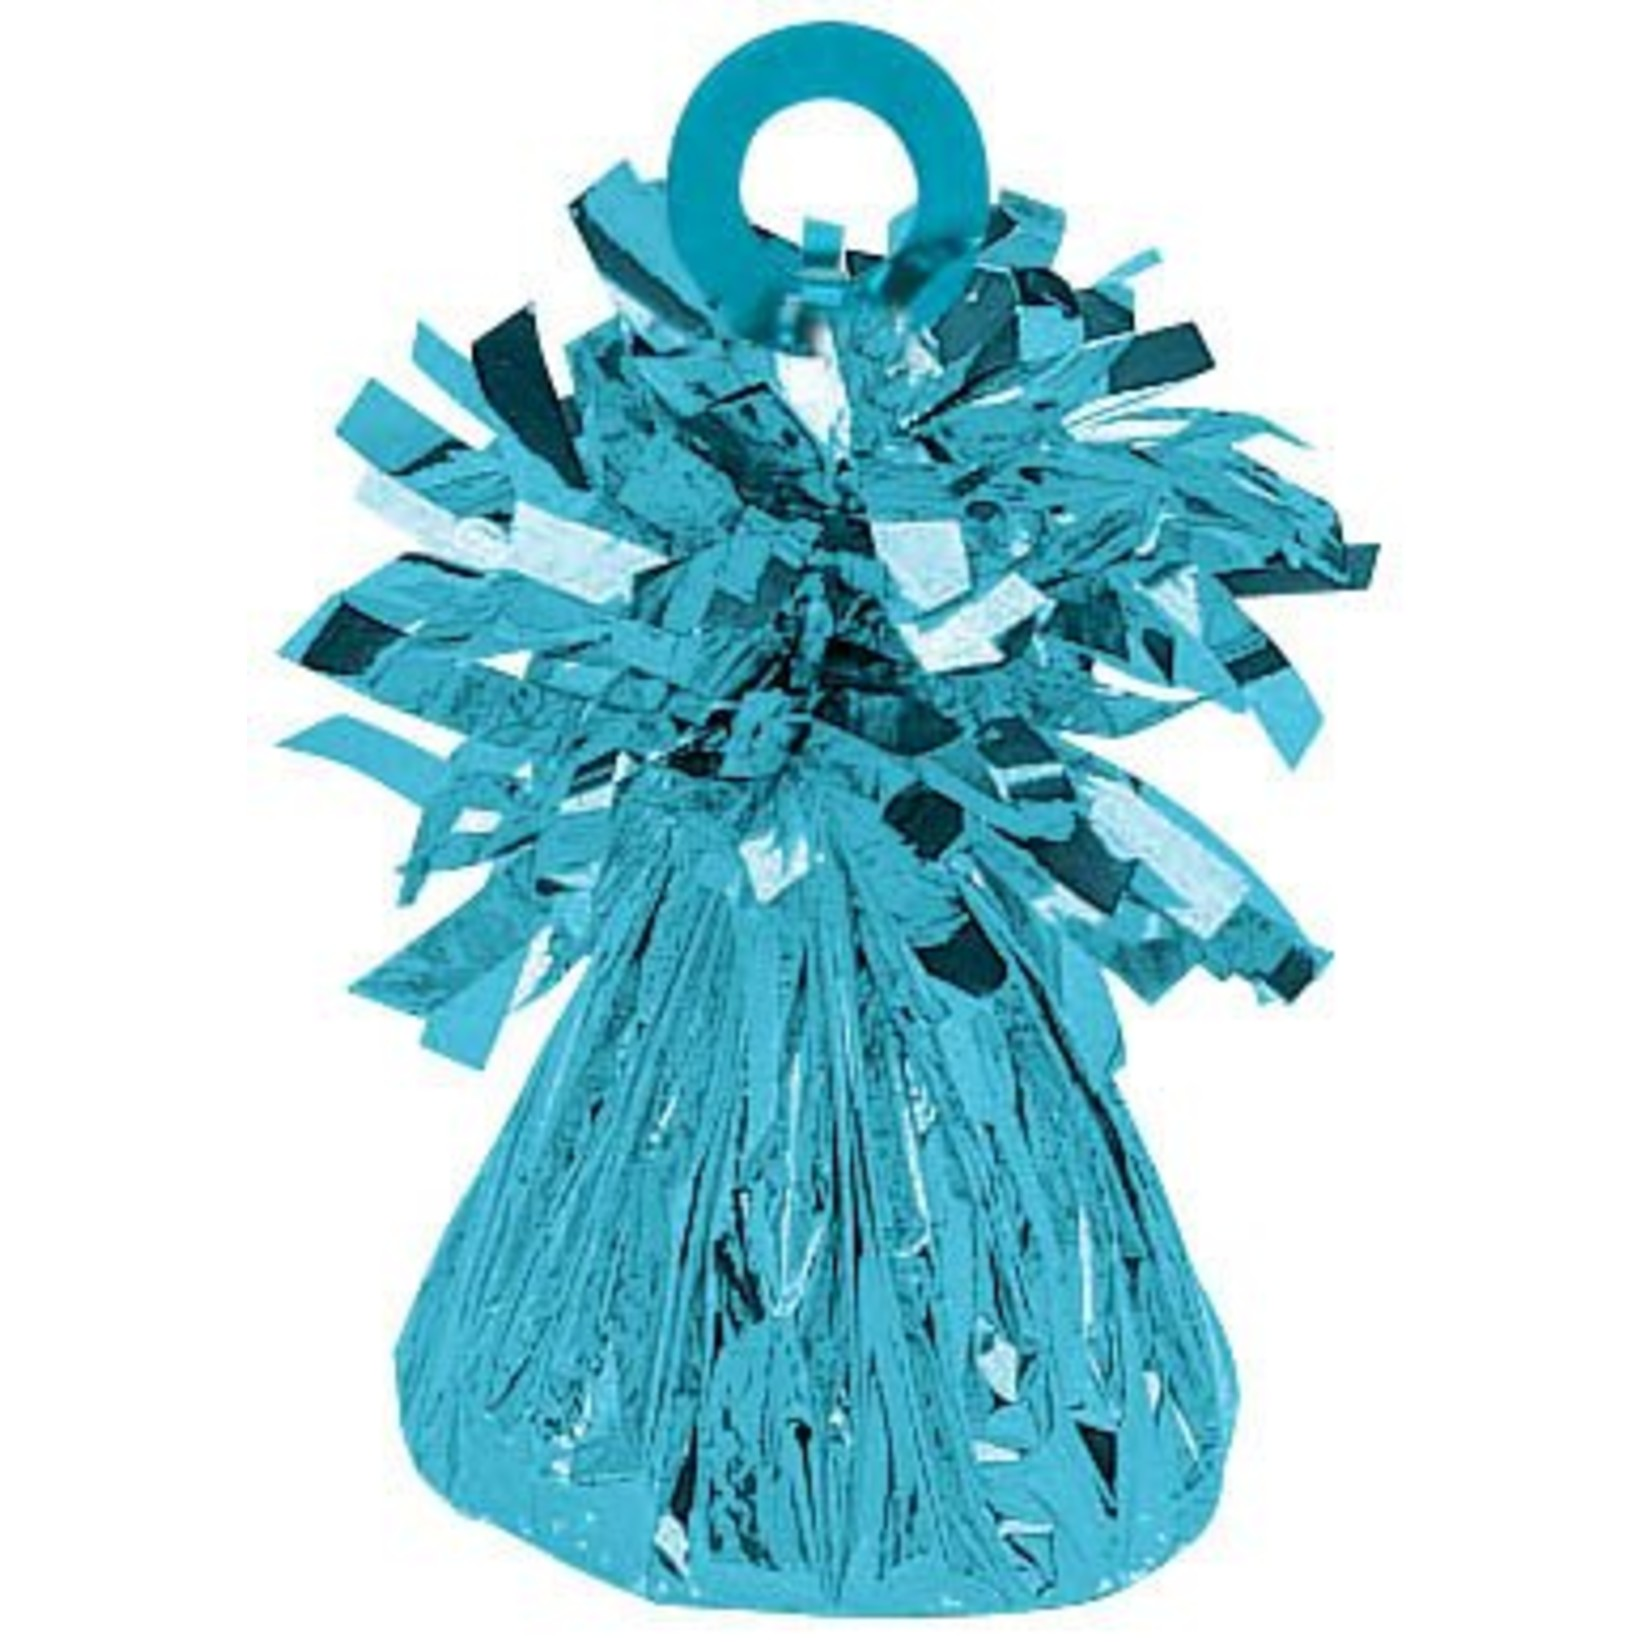 Balloon Weight-Small Foil-Caribbean Blue-6oz